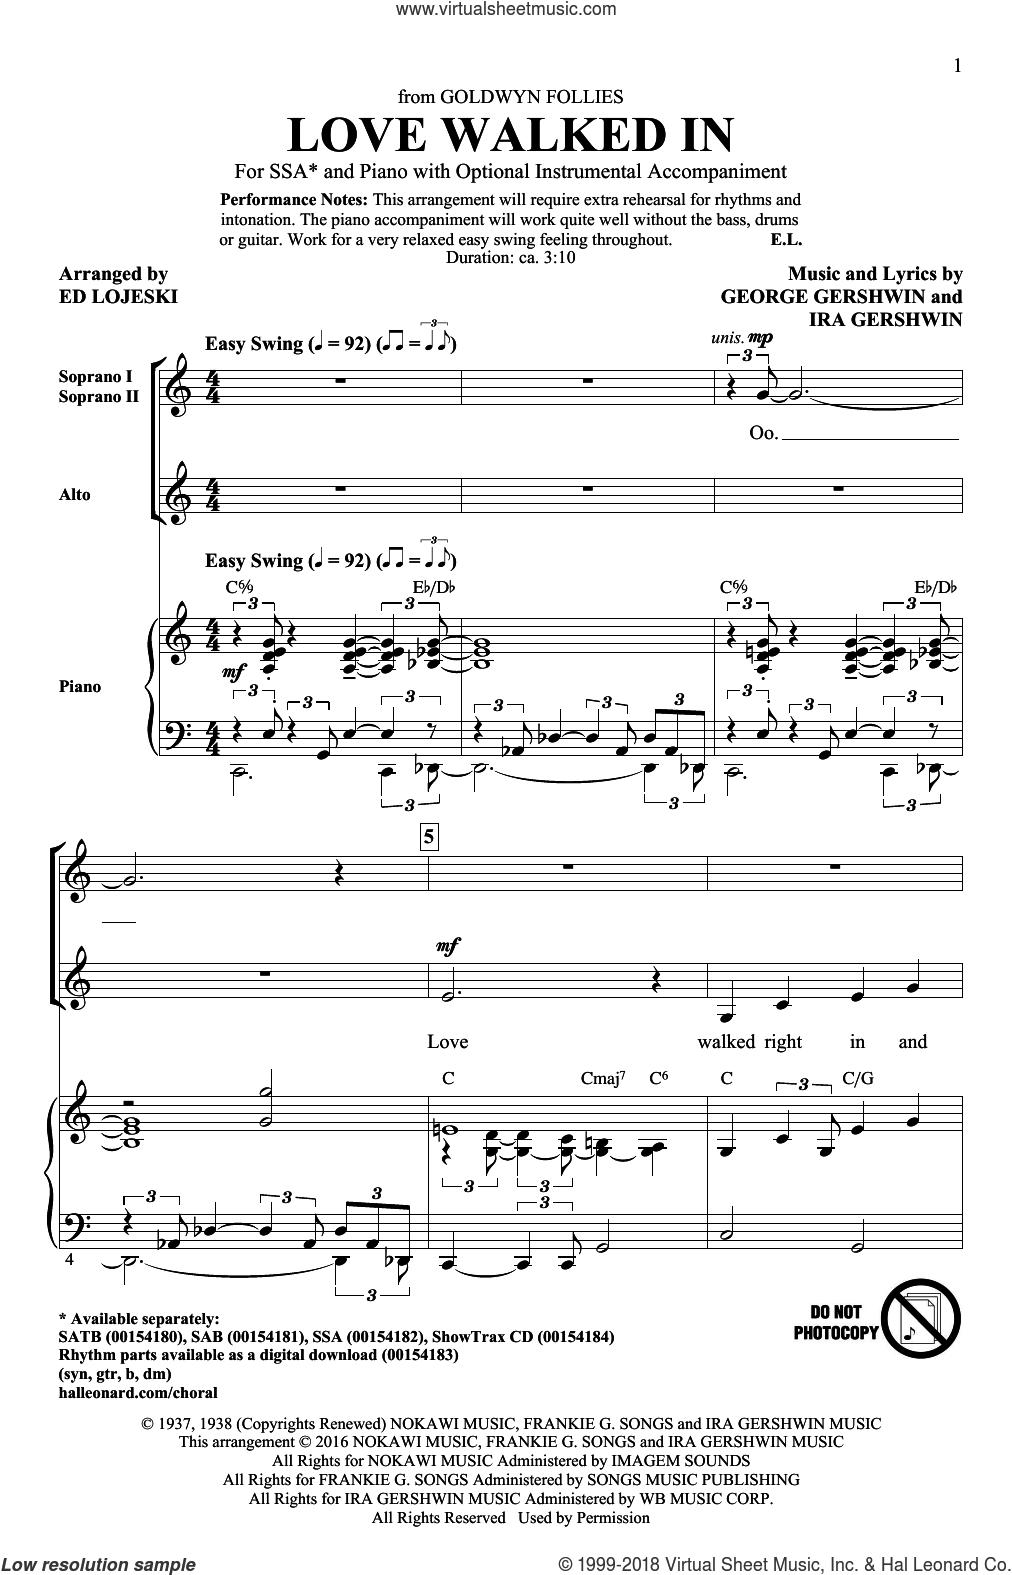 Love Walked In sheet music for choir (SSA: soprano, alto) by George Gershwin, Ed Lojeski and Ira Gershwin, intermediate skill level